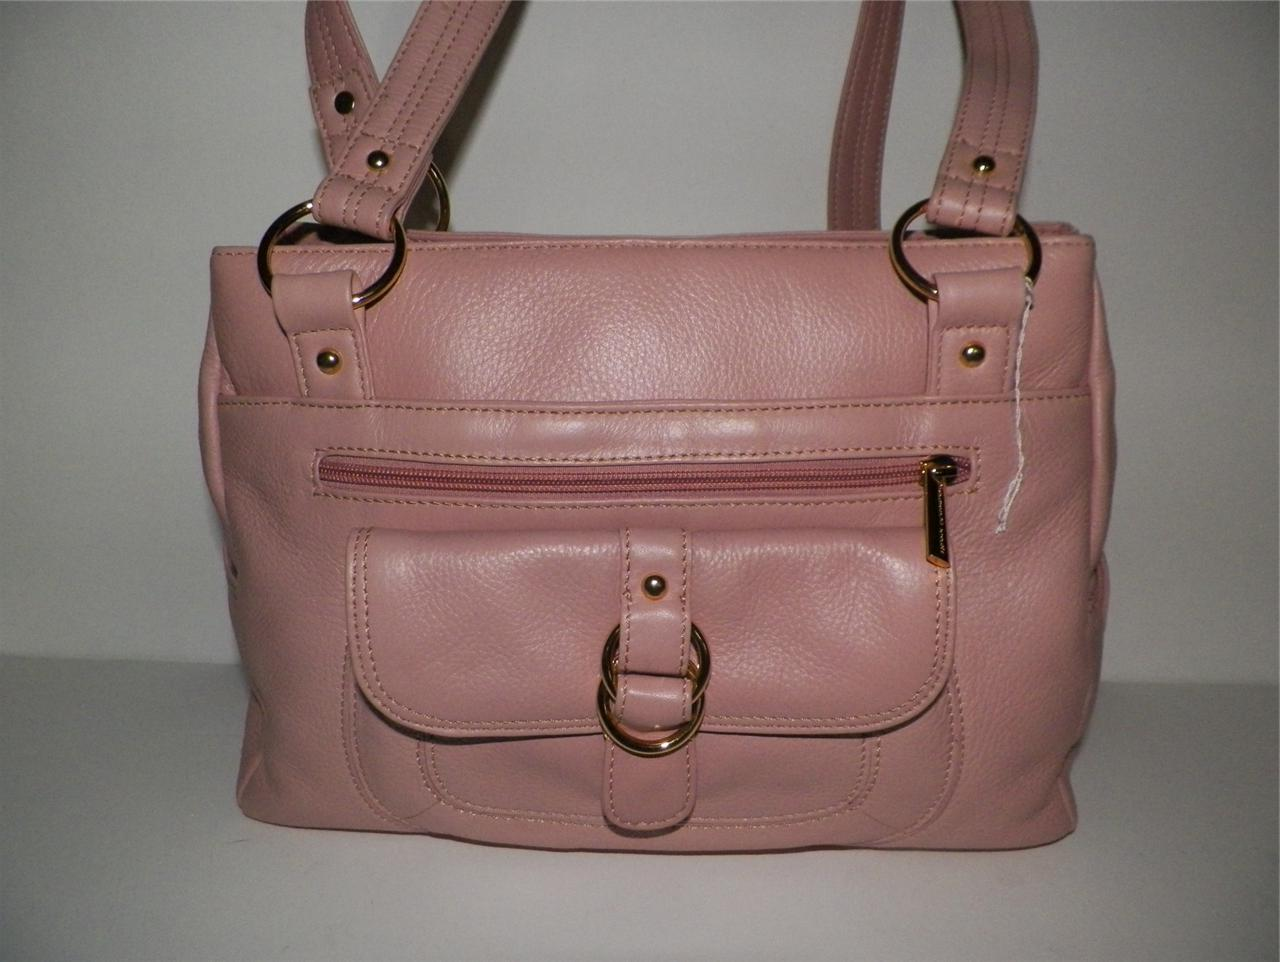 Stone Mountain Handbags Handbags And Purses On Bags